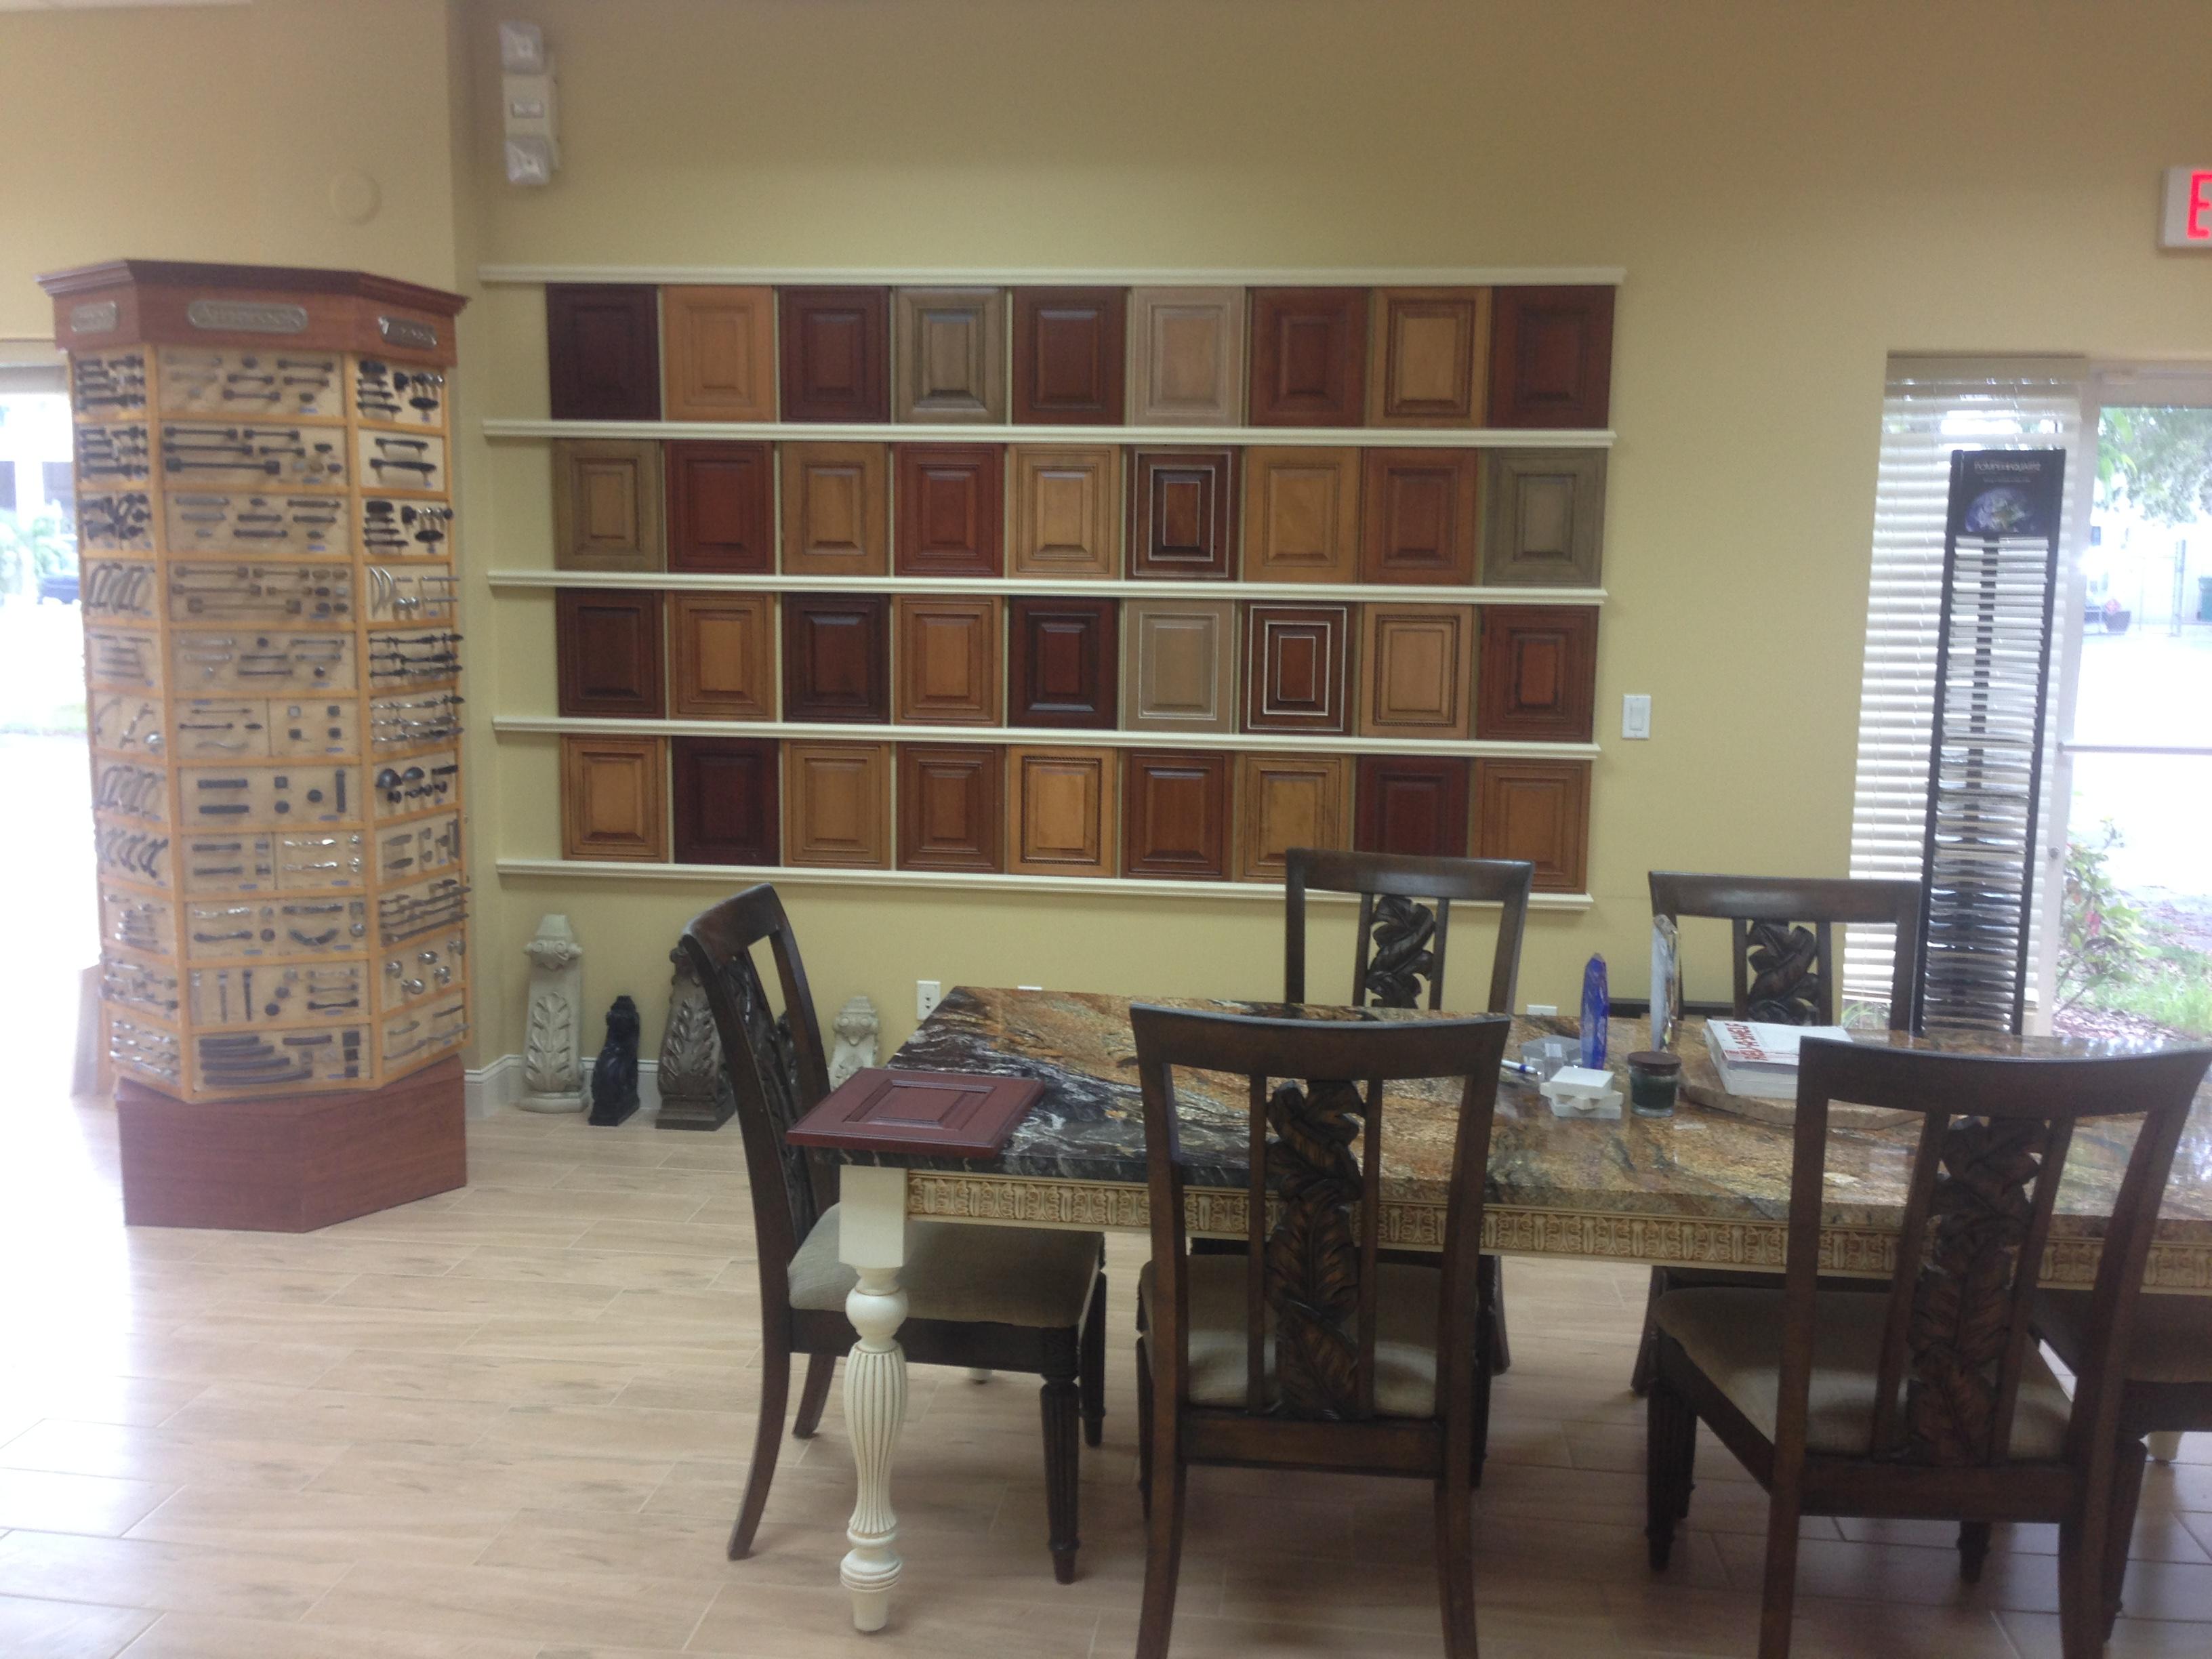 Superbe Custom Cabinet Refacing Of Naples,Inc. 2805 Horseshoe Dr S Ste 2, Naples,  FL 34104   YP.com